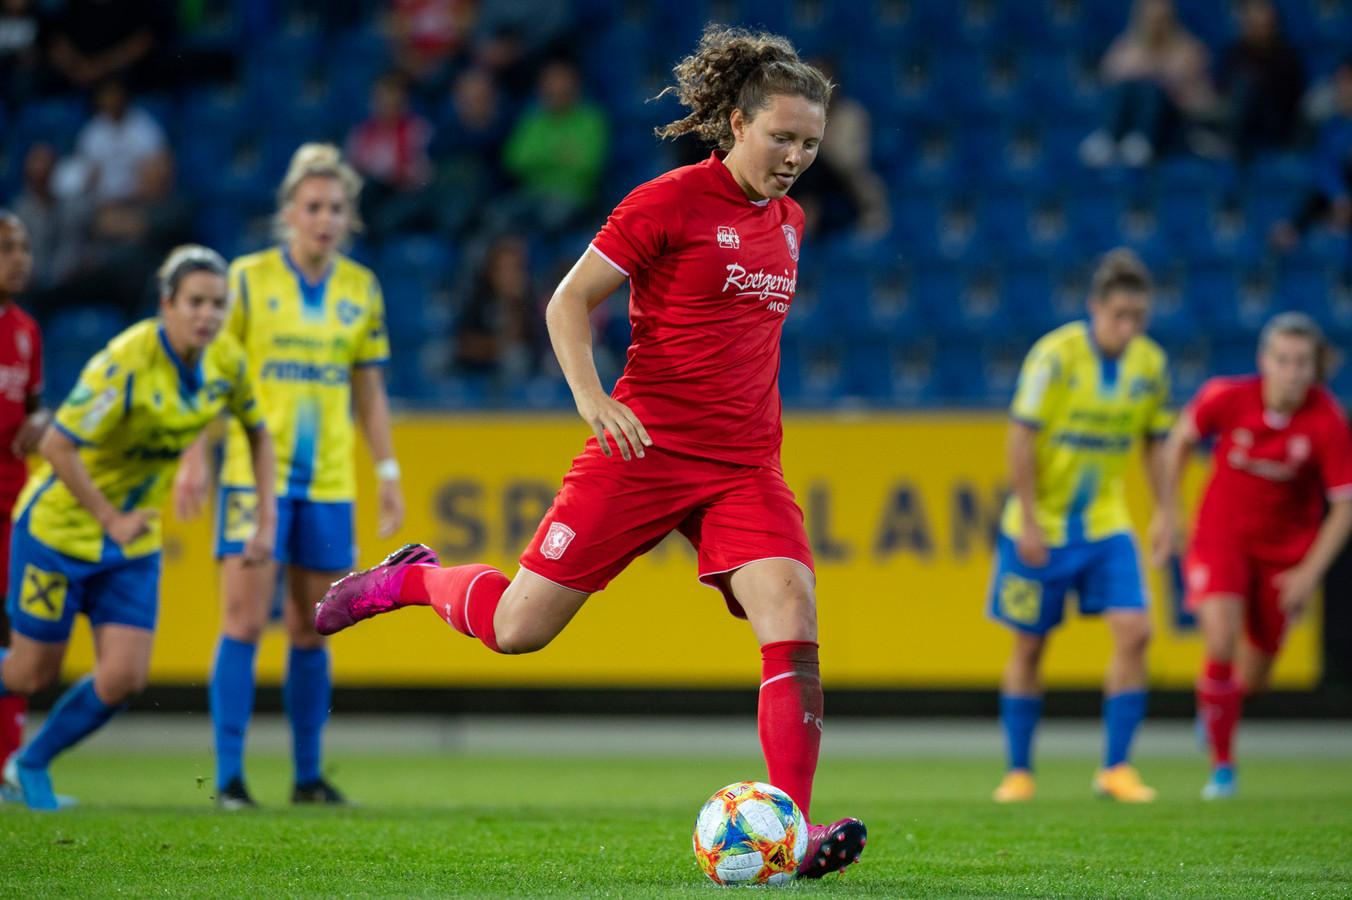 Fenna Kalma van FC Twente scoort 0-3.